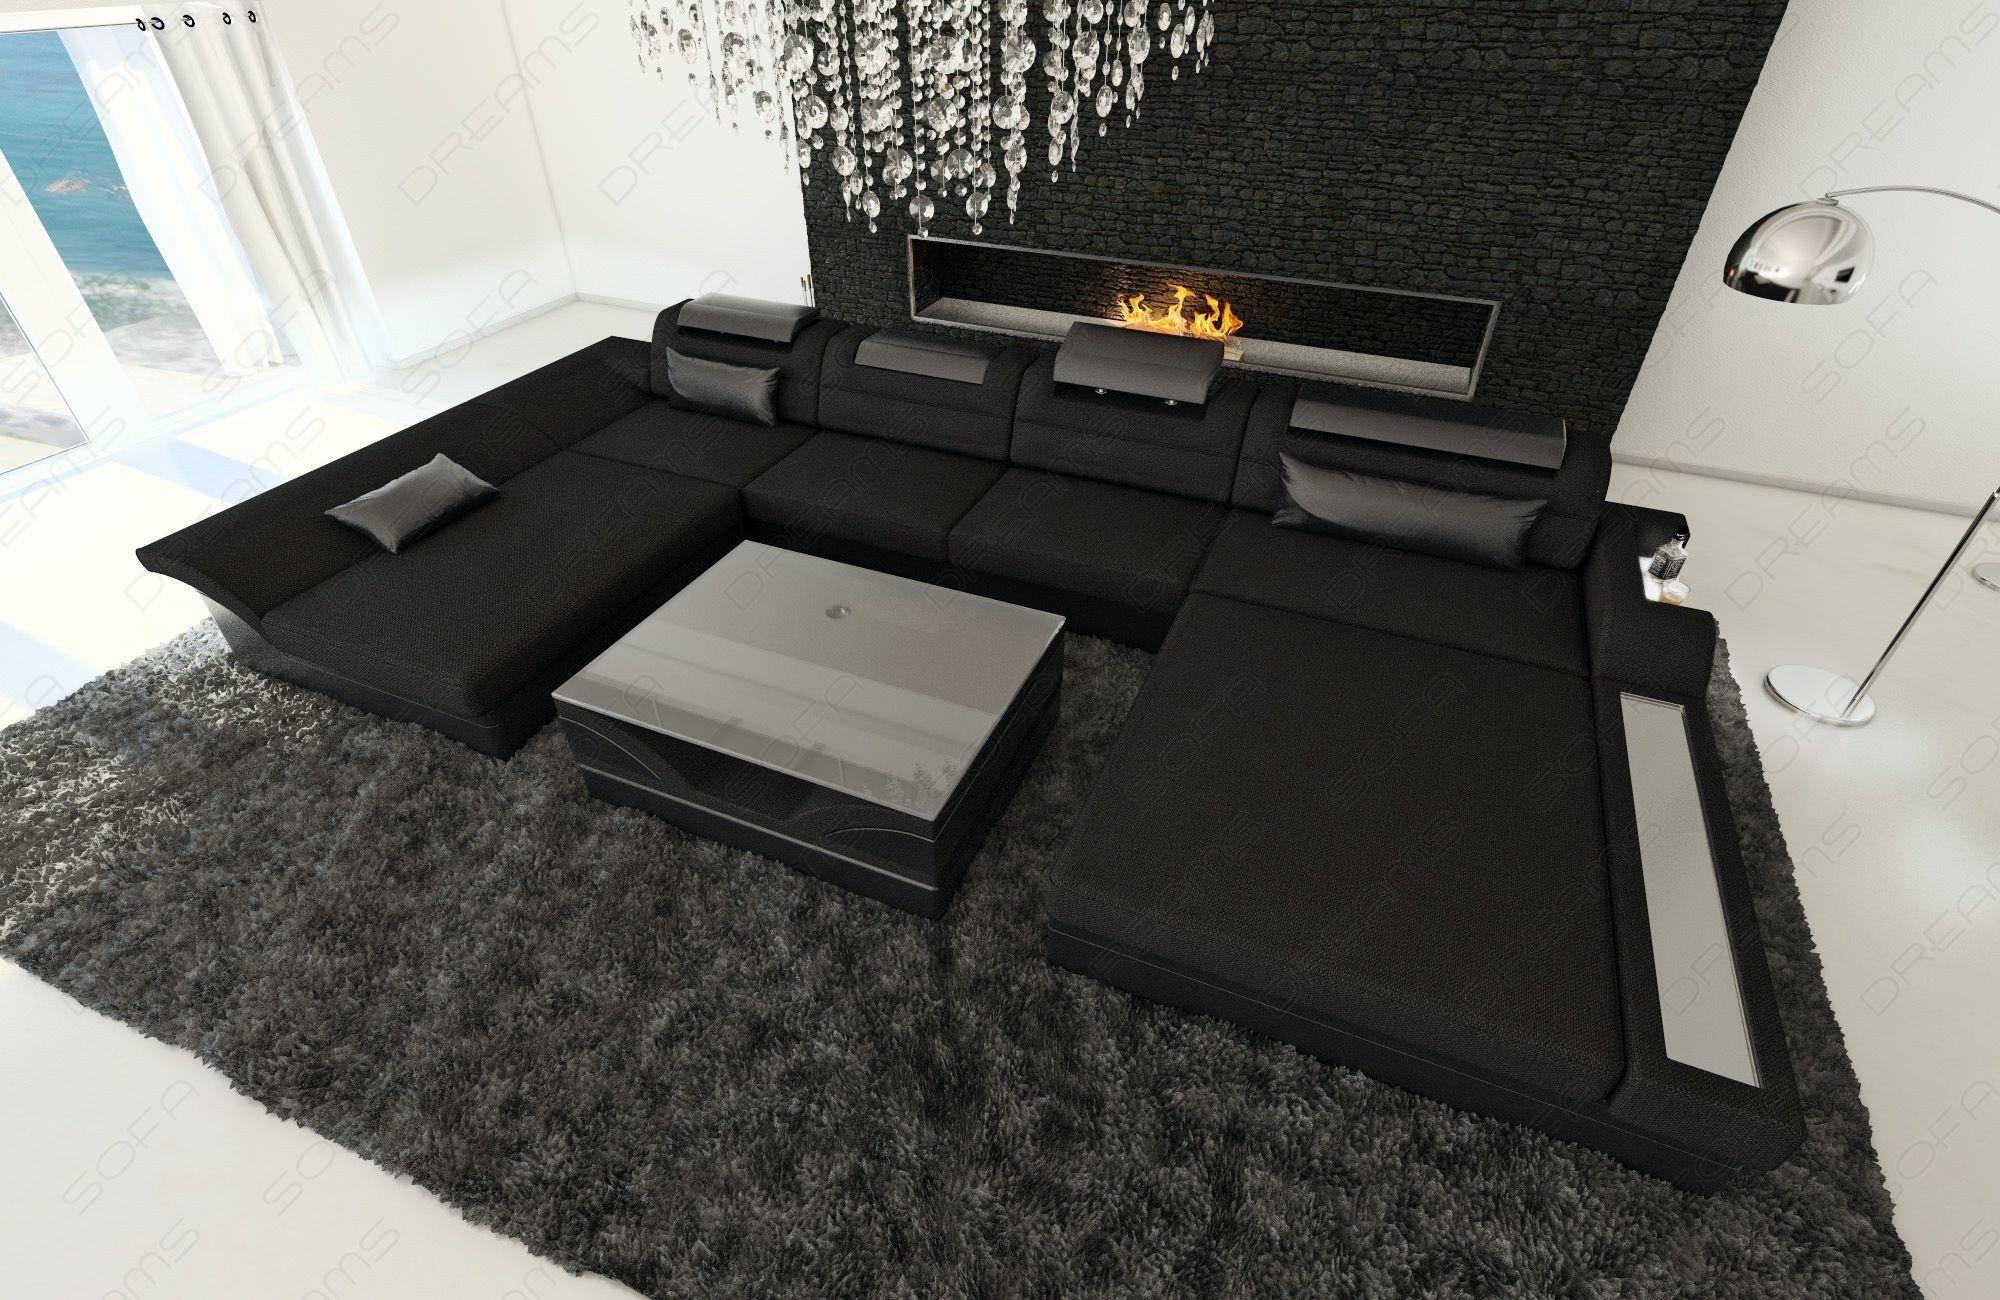 Fabric Sectional Sofa Chicago LED | Sectional sofa, Fabric ...